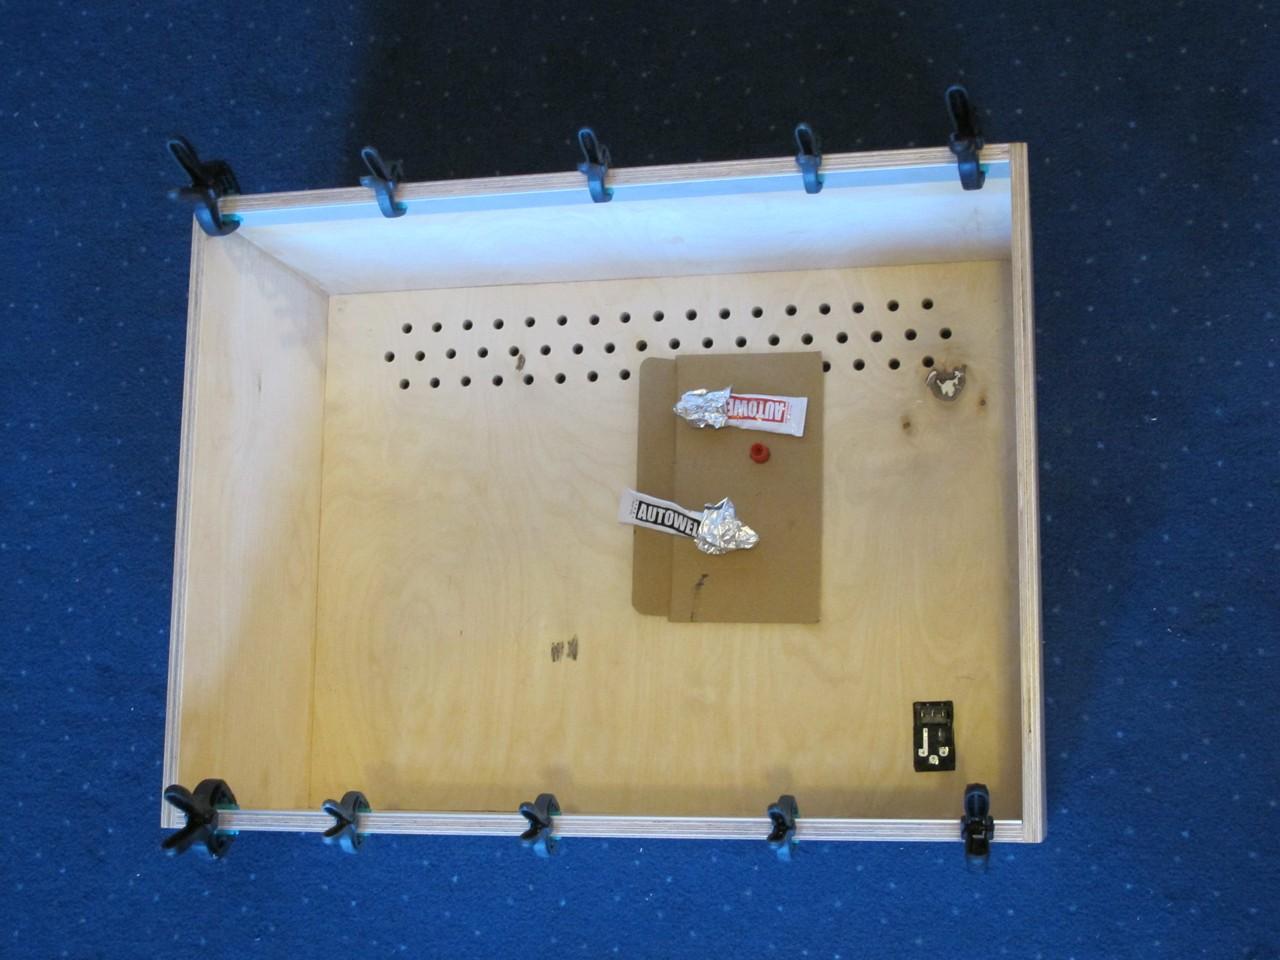 Glueing aluminium profile to wooden box